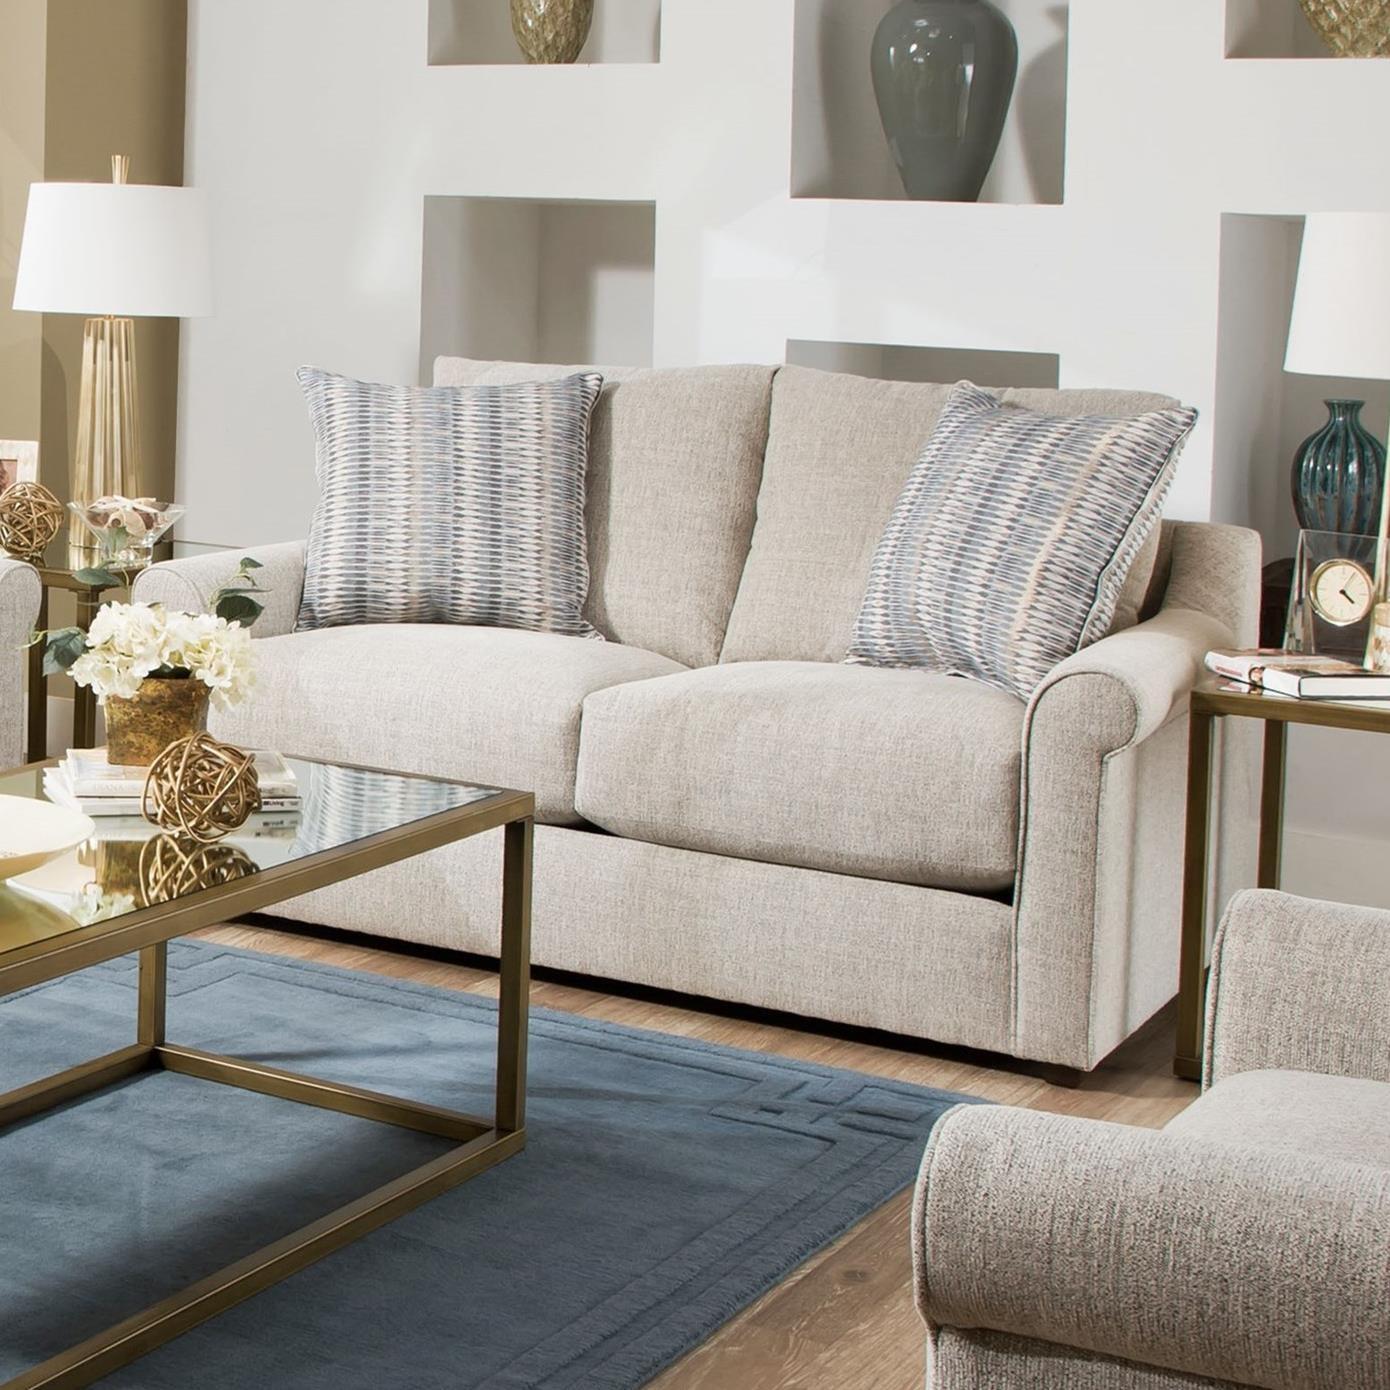 United Furniture Industries 9910 Love Seat - Item Number: 9910BRLoveseat-Gypsy Peble